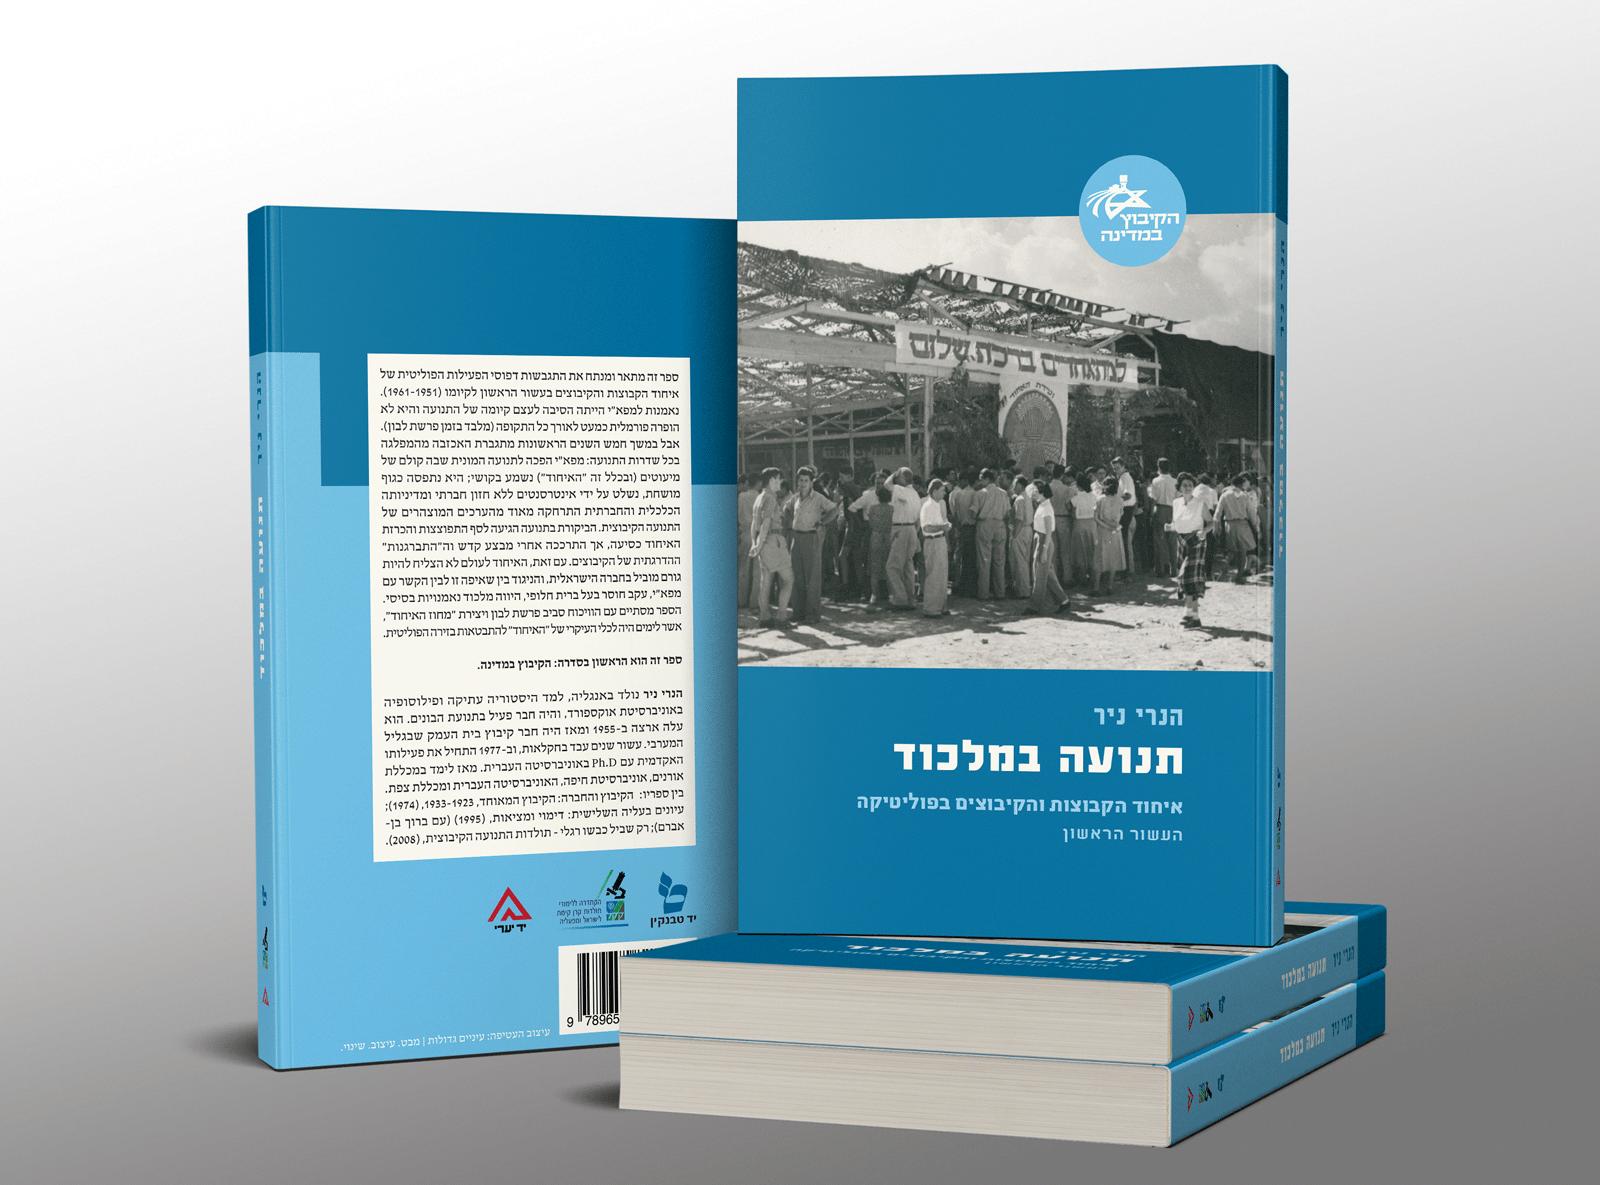 https://bigeyes.co.il/wp-content/uploads/2019/08/kibbutz-books-1.png